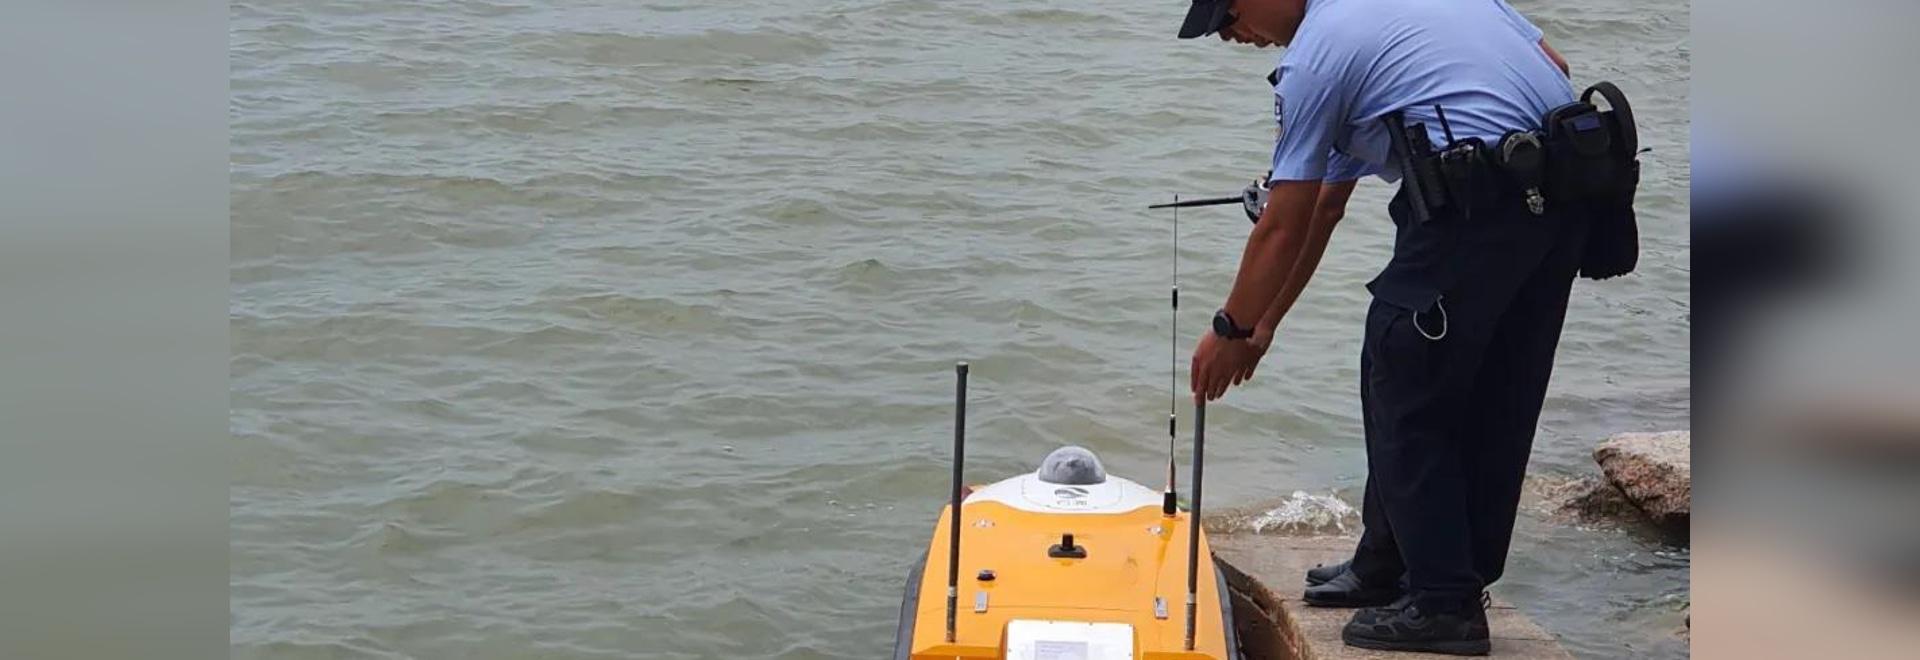 OceanAlpha 5G Police Unmanned Boat guards Shenzhen coastline